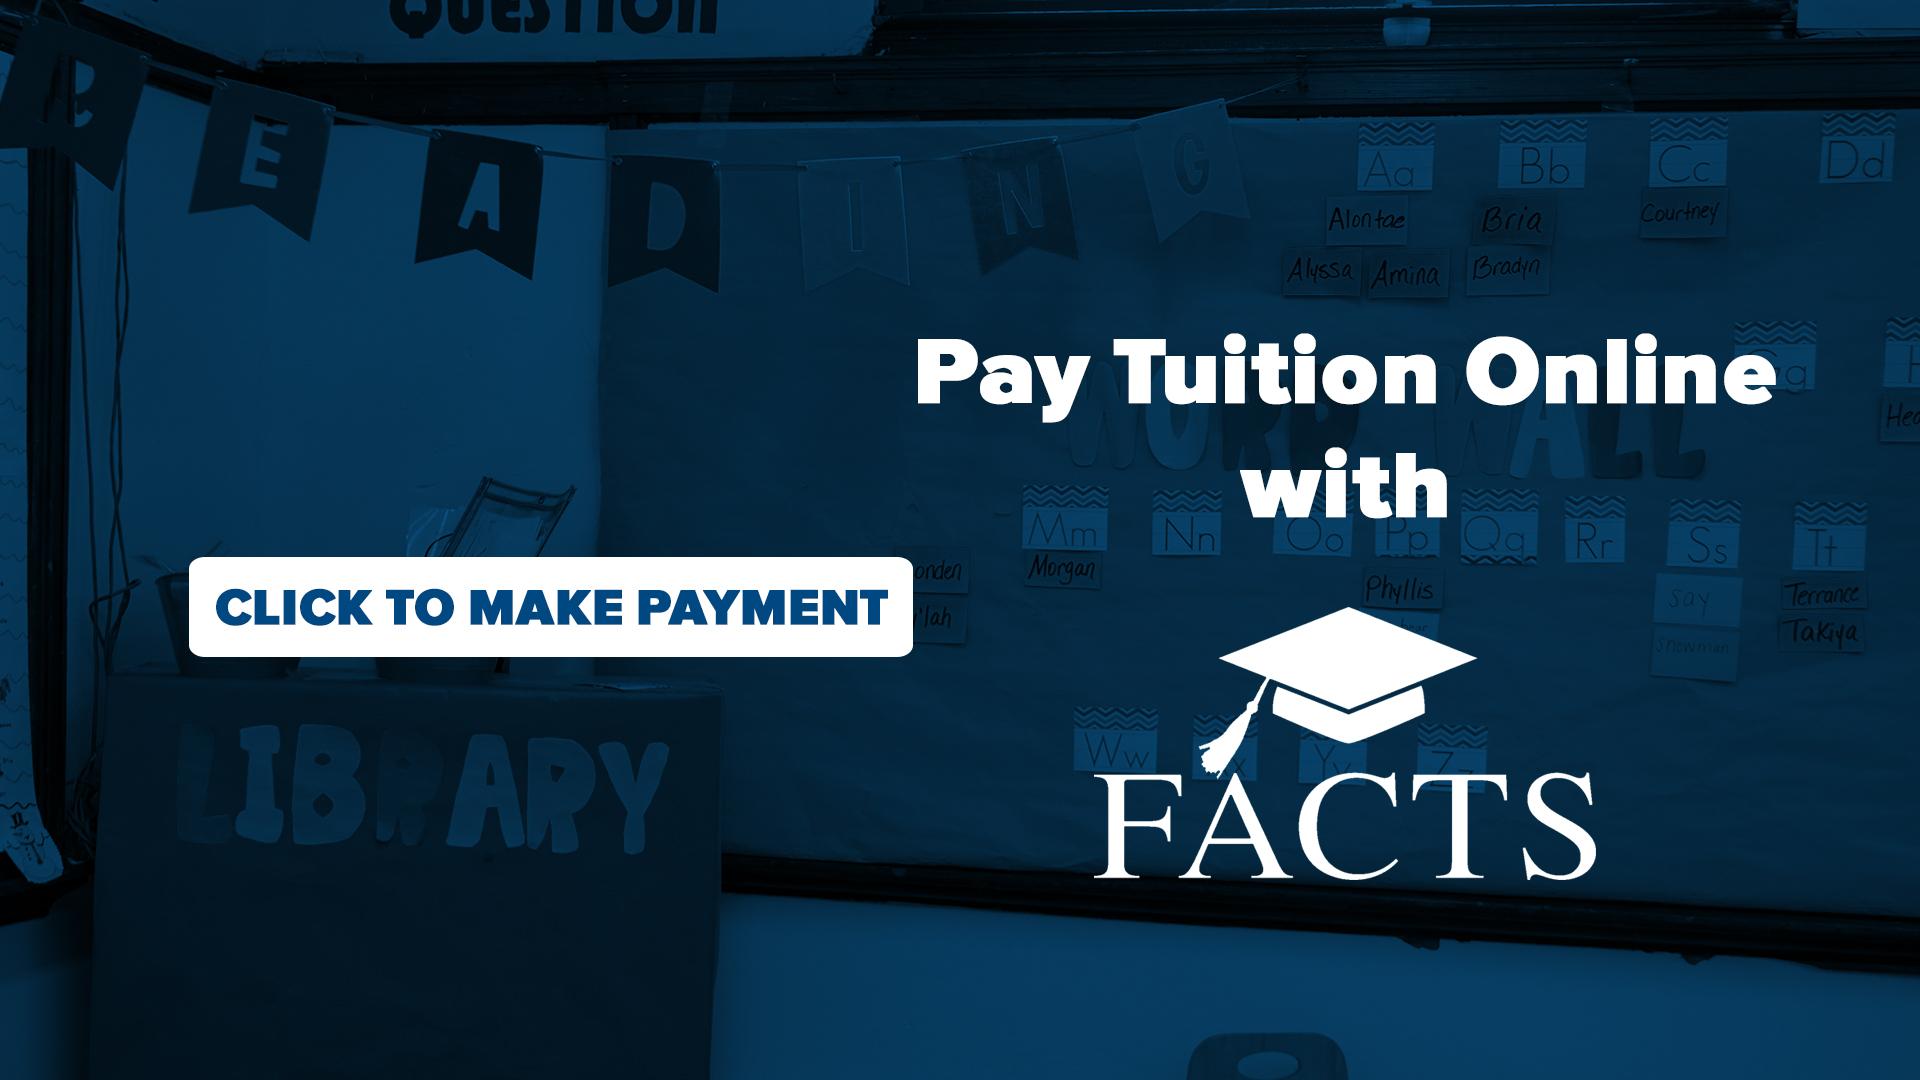 Tution Payment.jpg